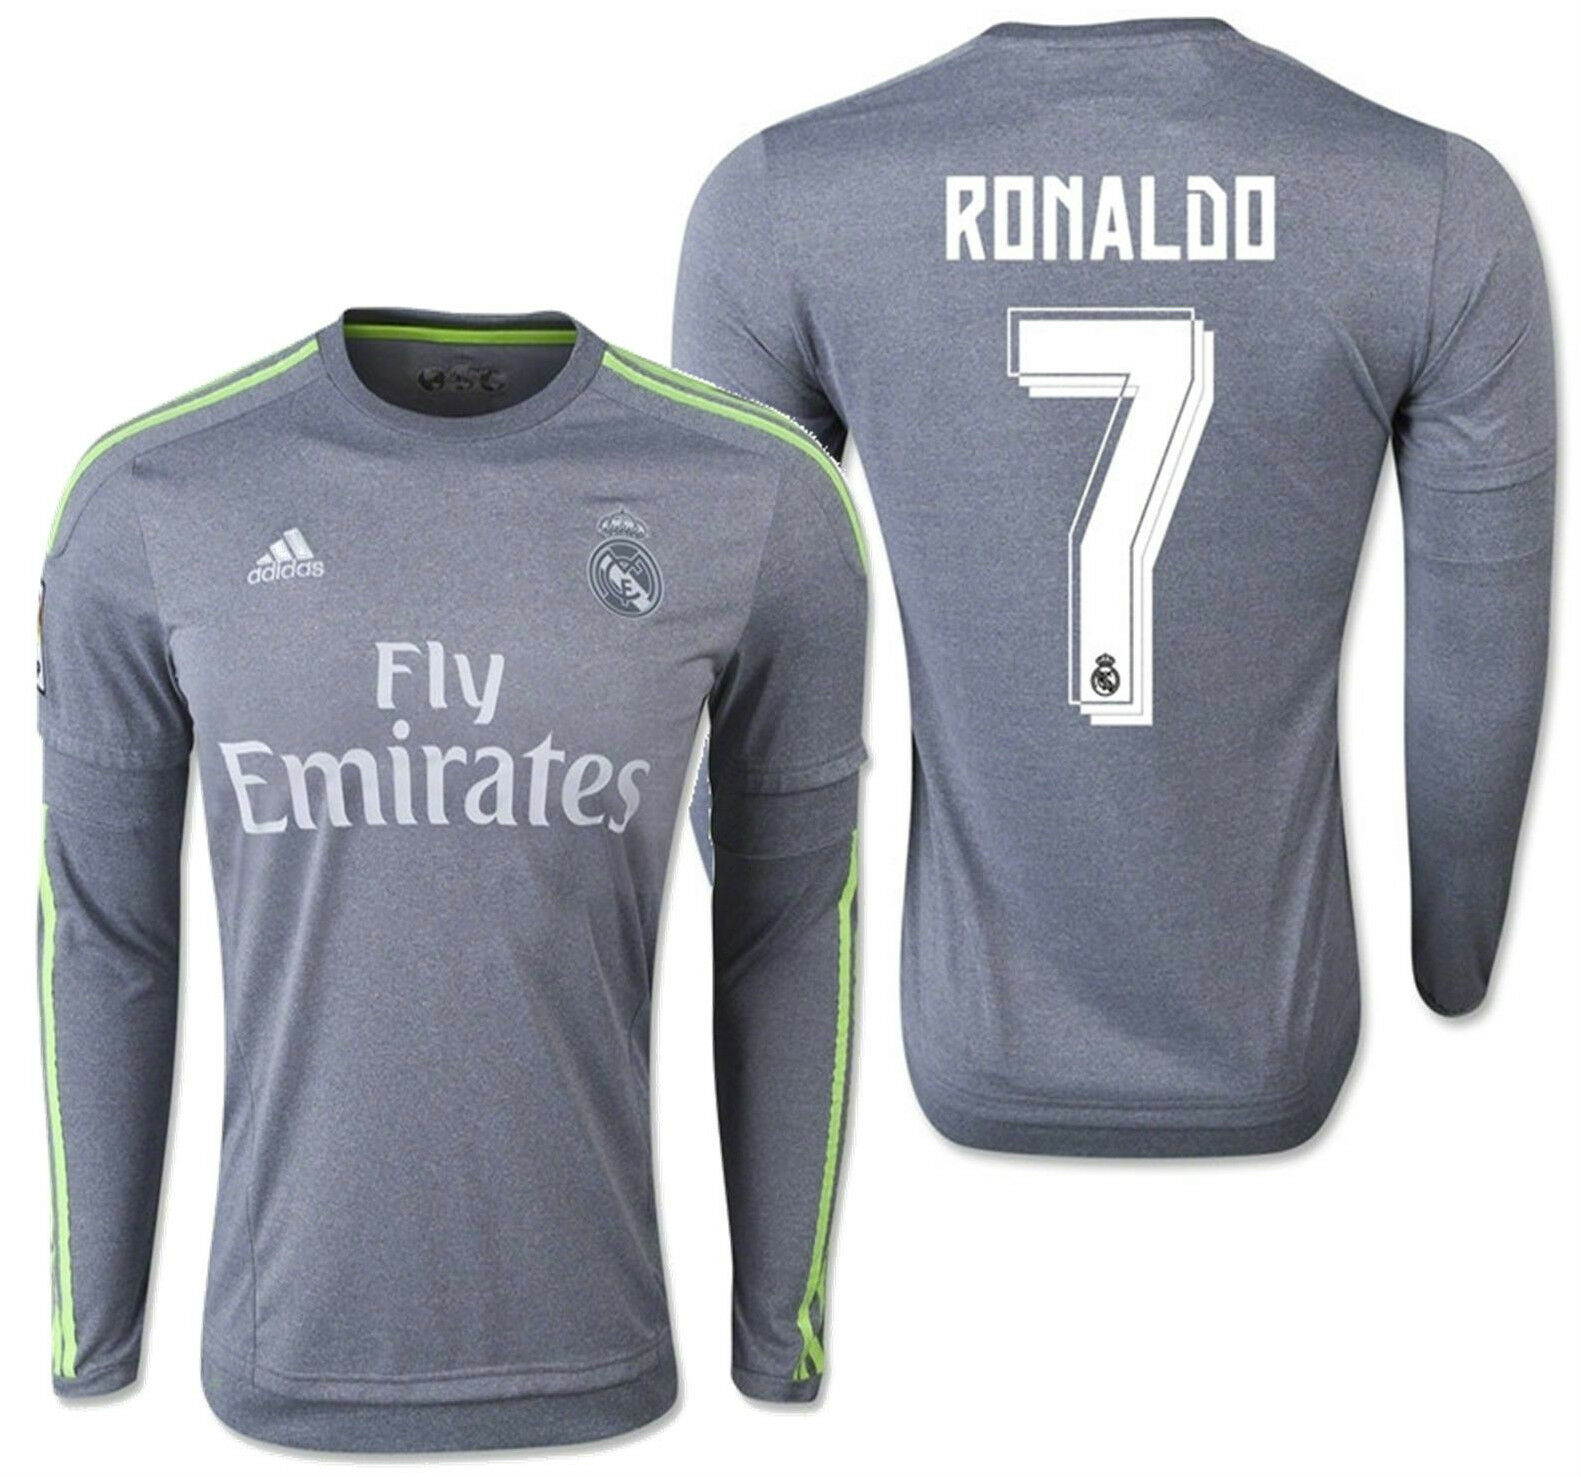 Adidas Cristiano Ronaldo Real Madrid Manga Larga Away Jersey 2015 16 la Liga